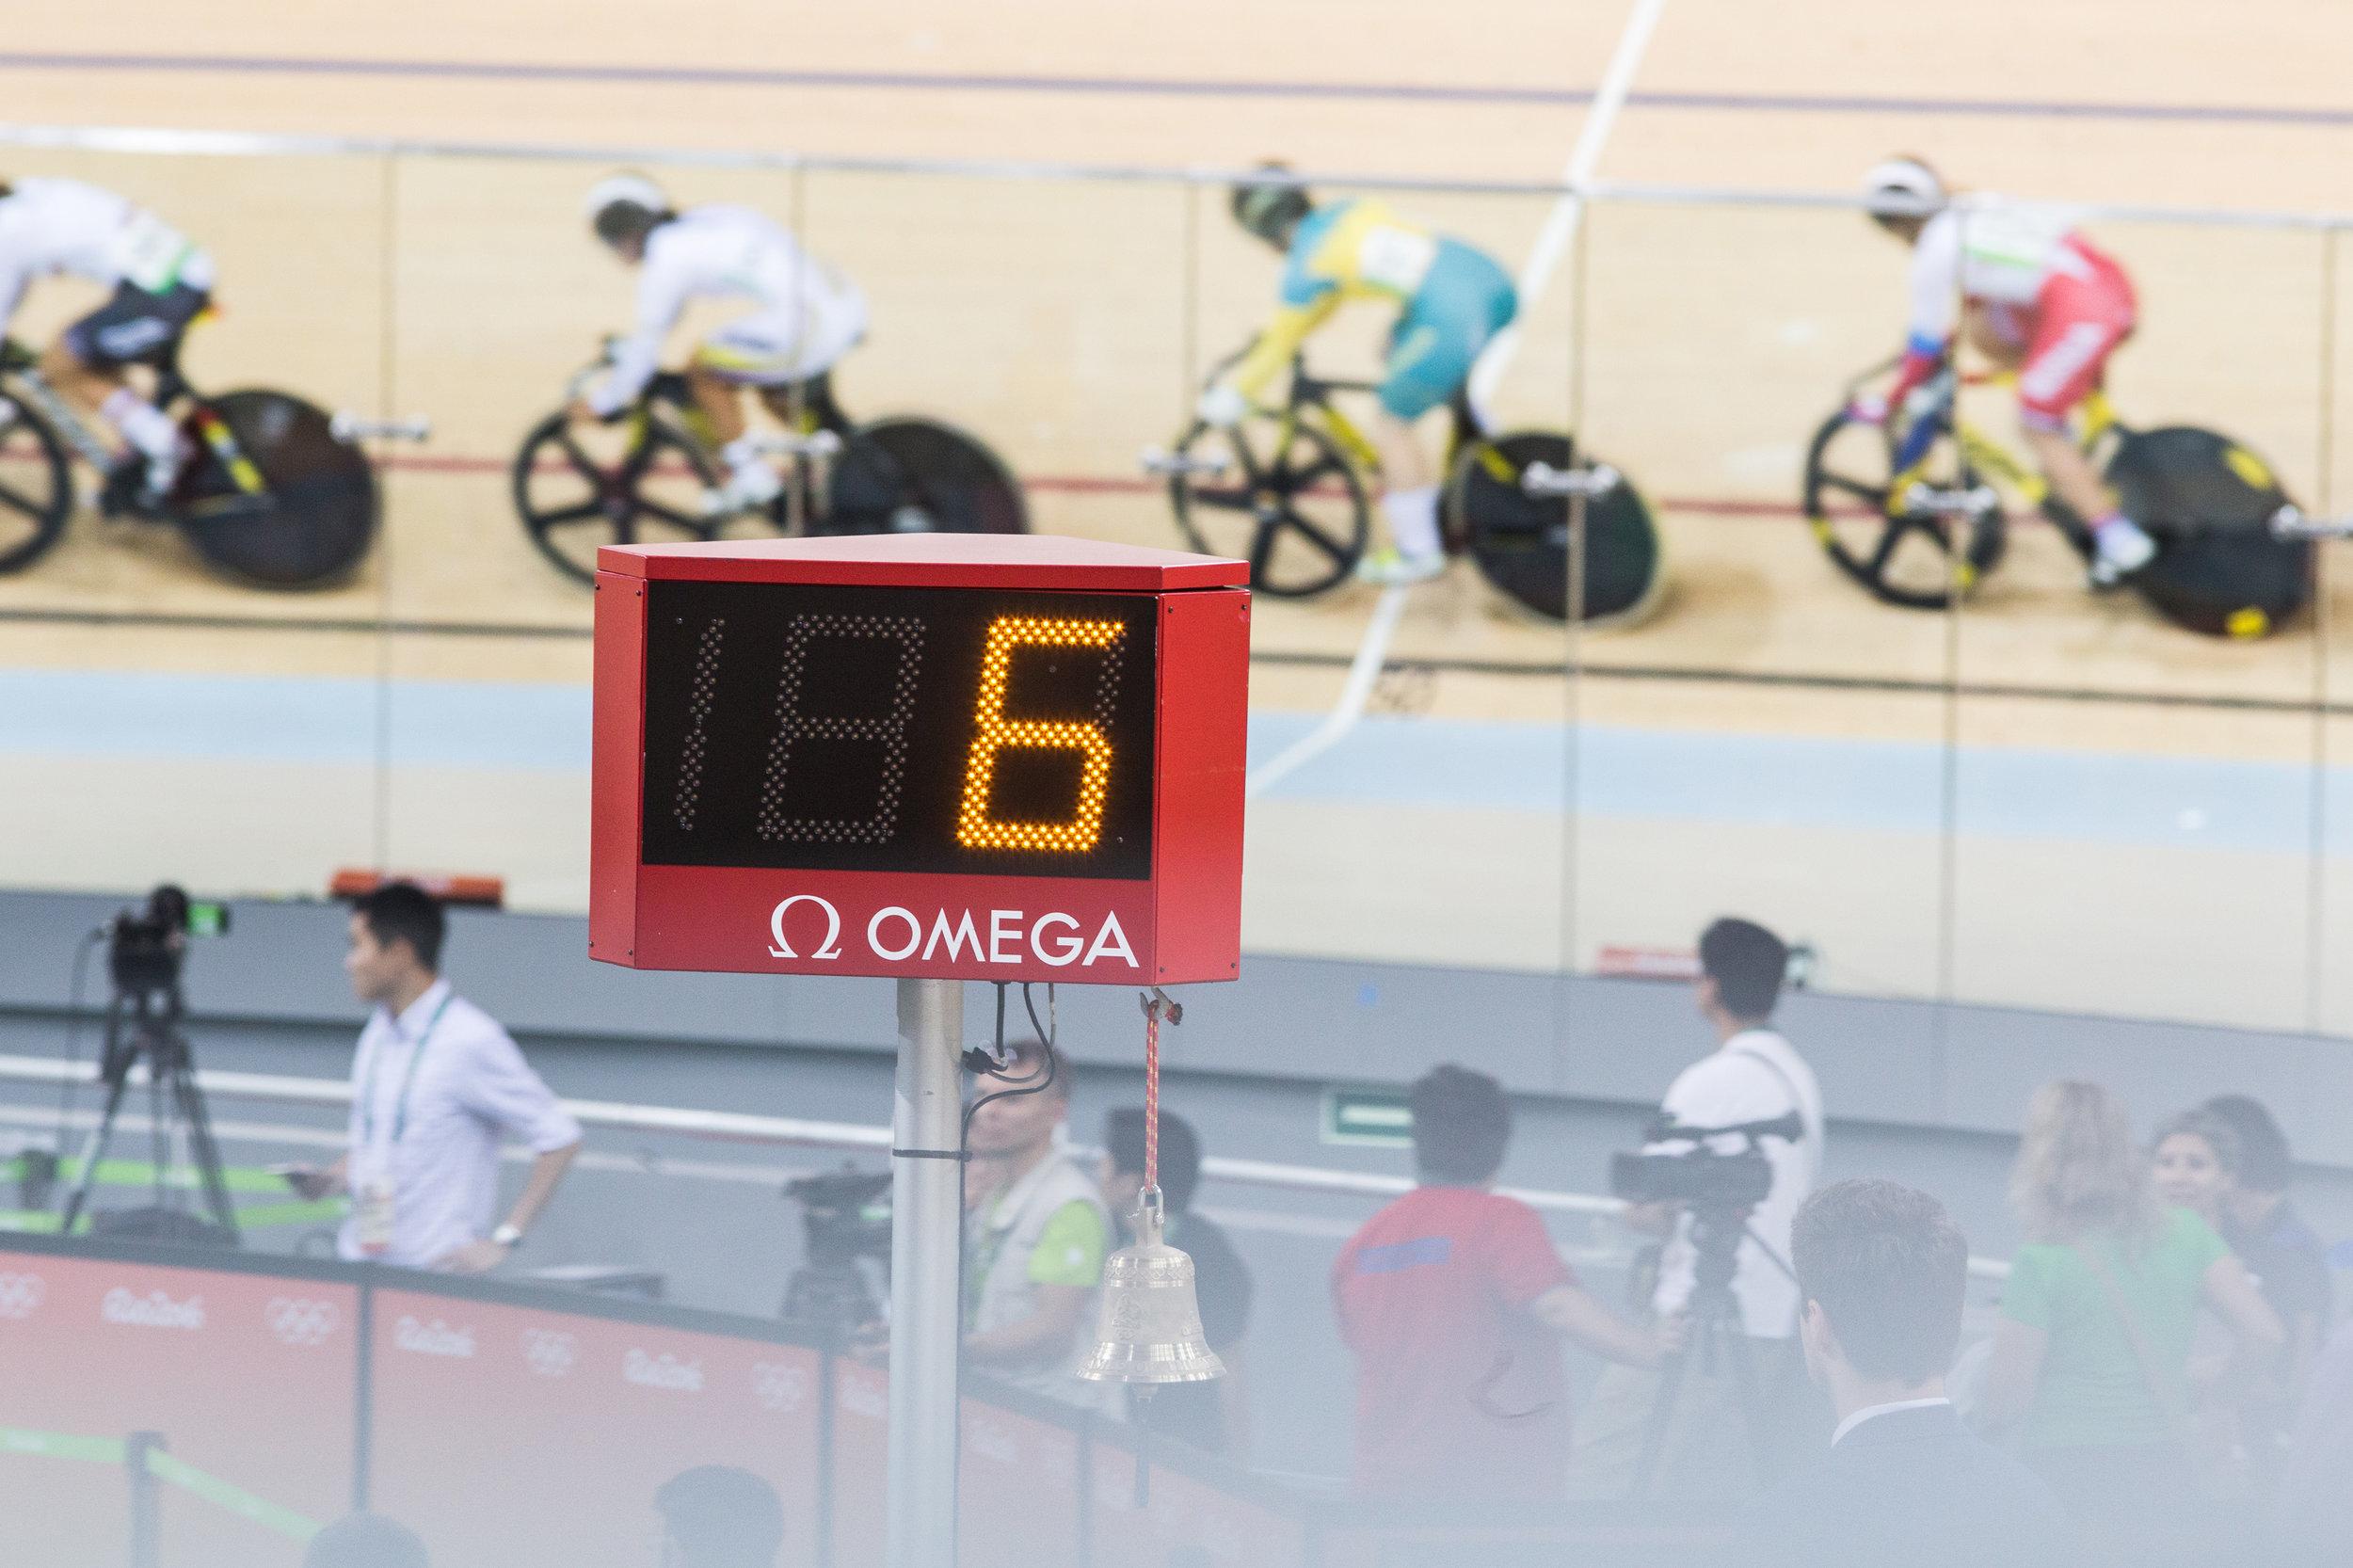 OMEGA_RIO16 Cycling_05.jpg